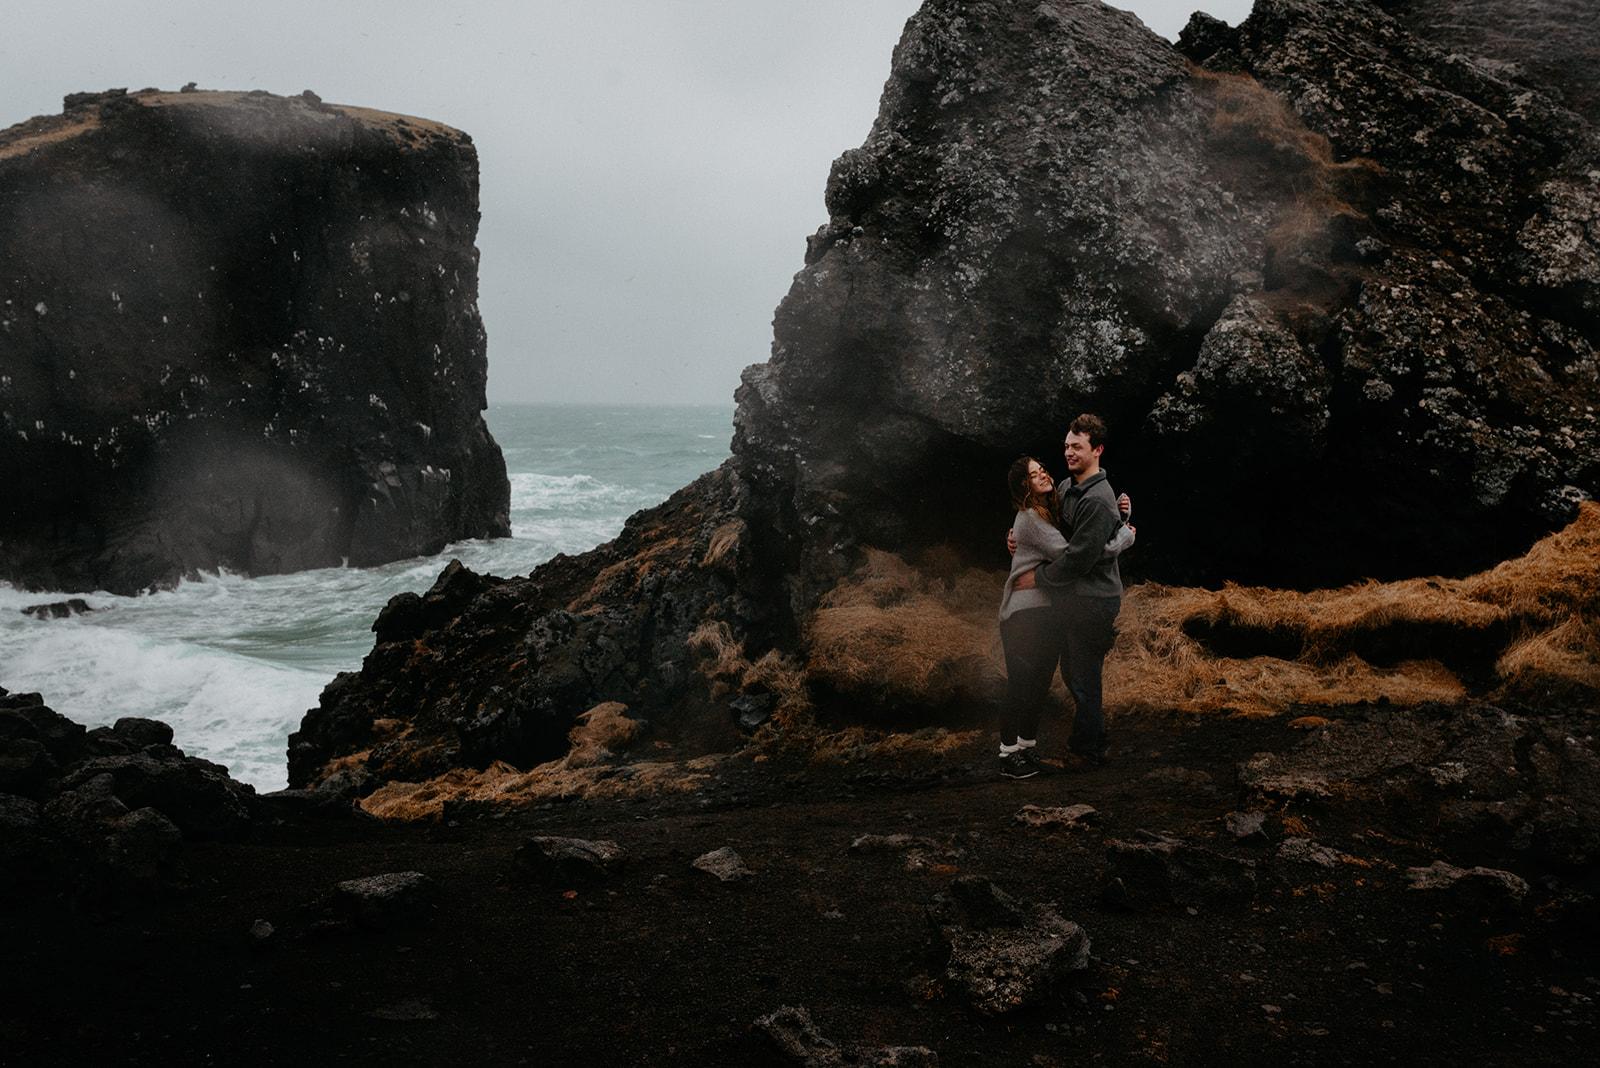 Mack & Michael - Sesja na Islandii 13 alebosco islandia mm 13